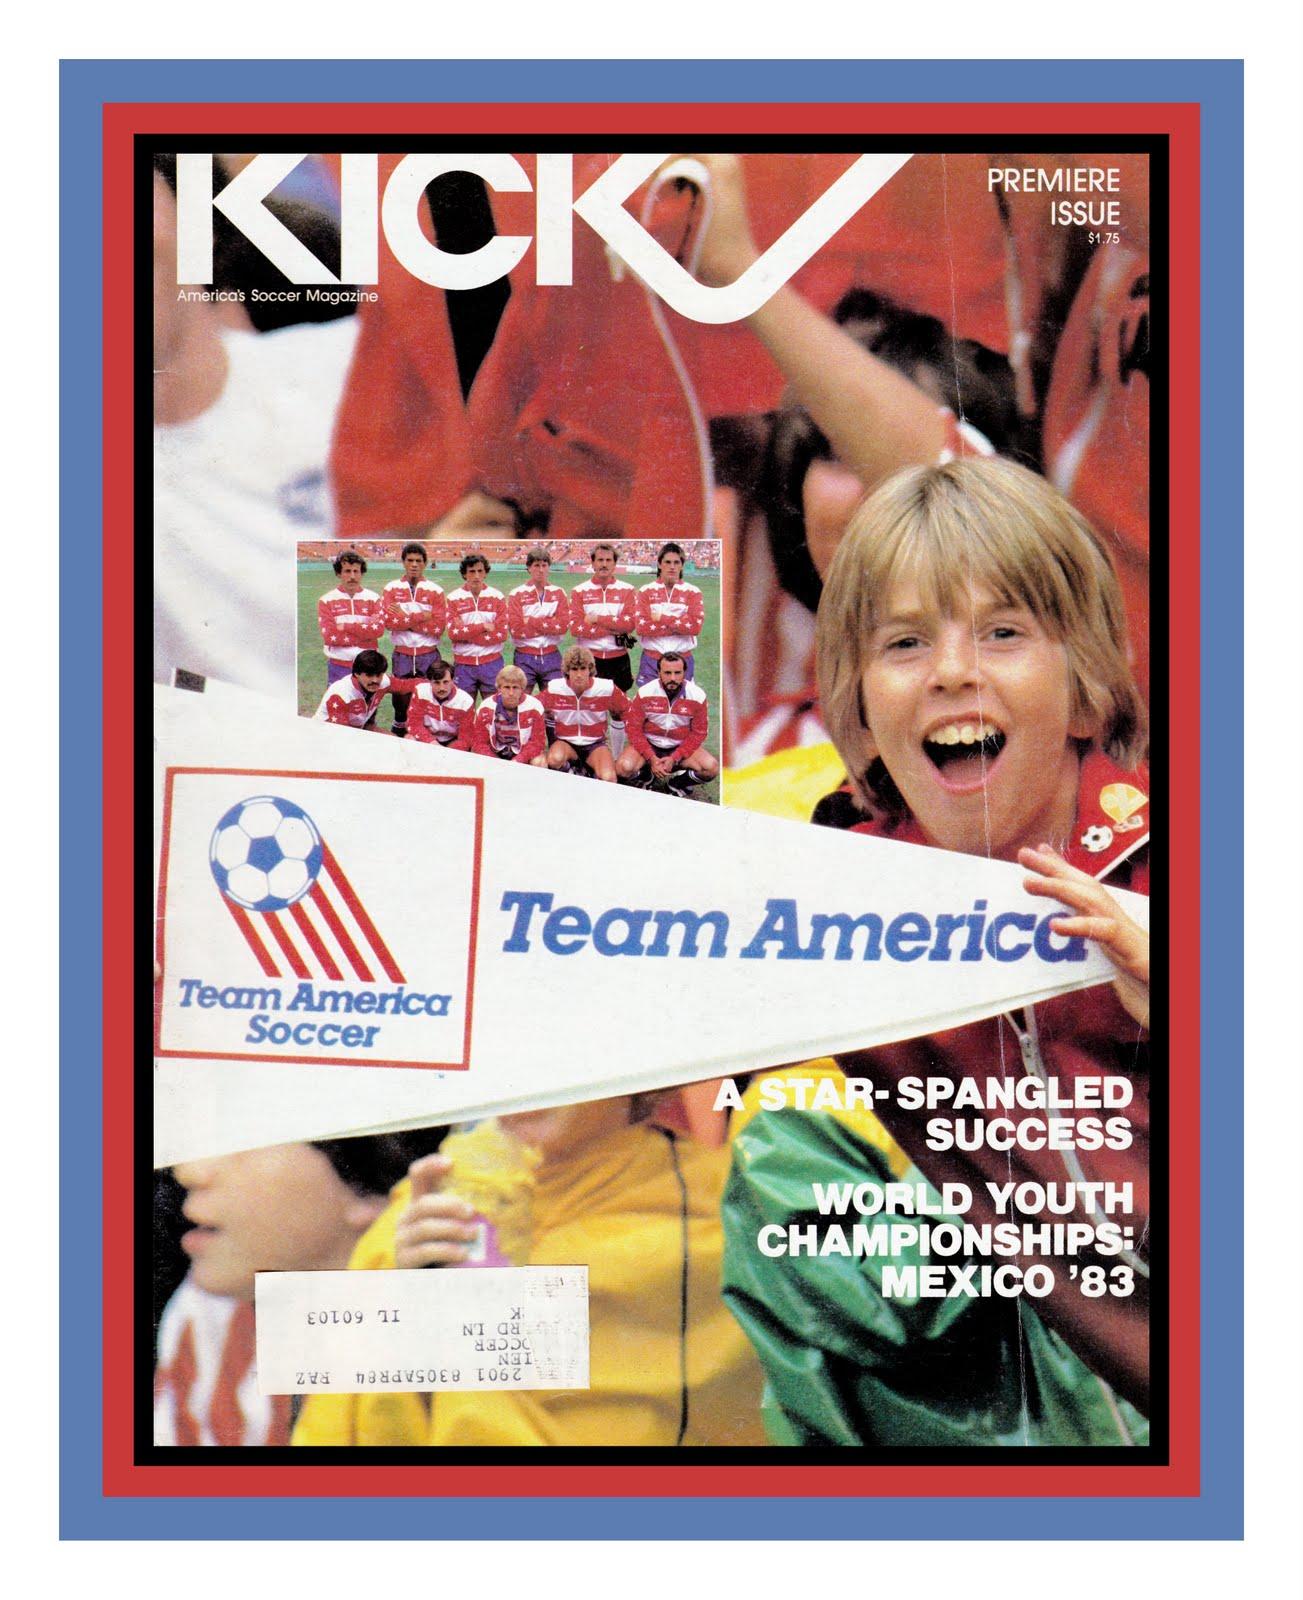 kickteamamerica1983.jpg